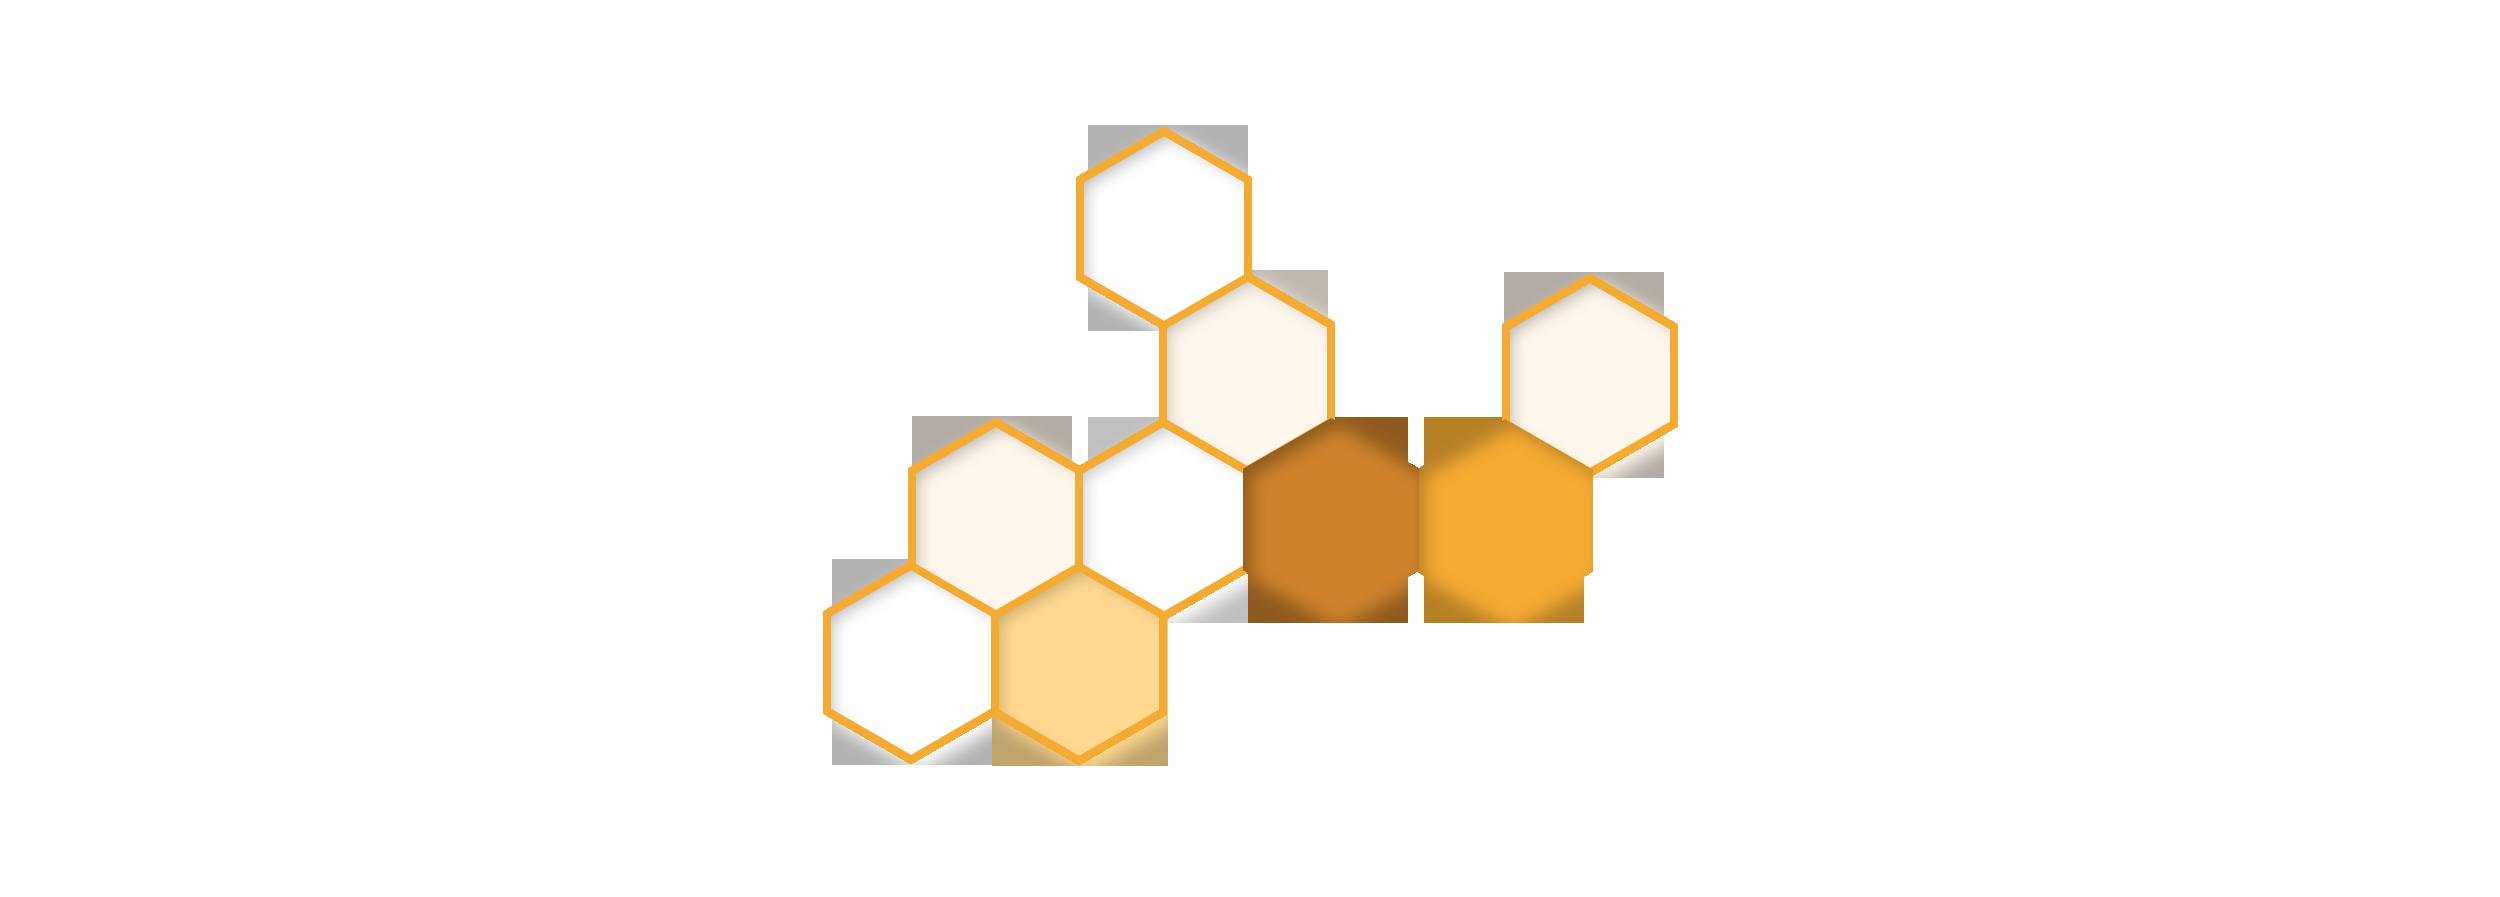 honeycomb_c3.png